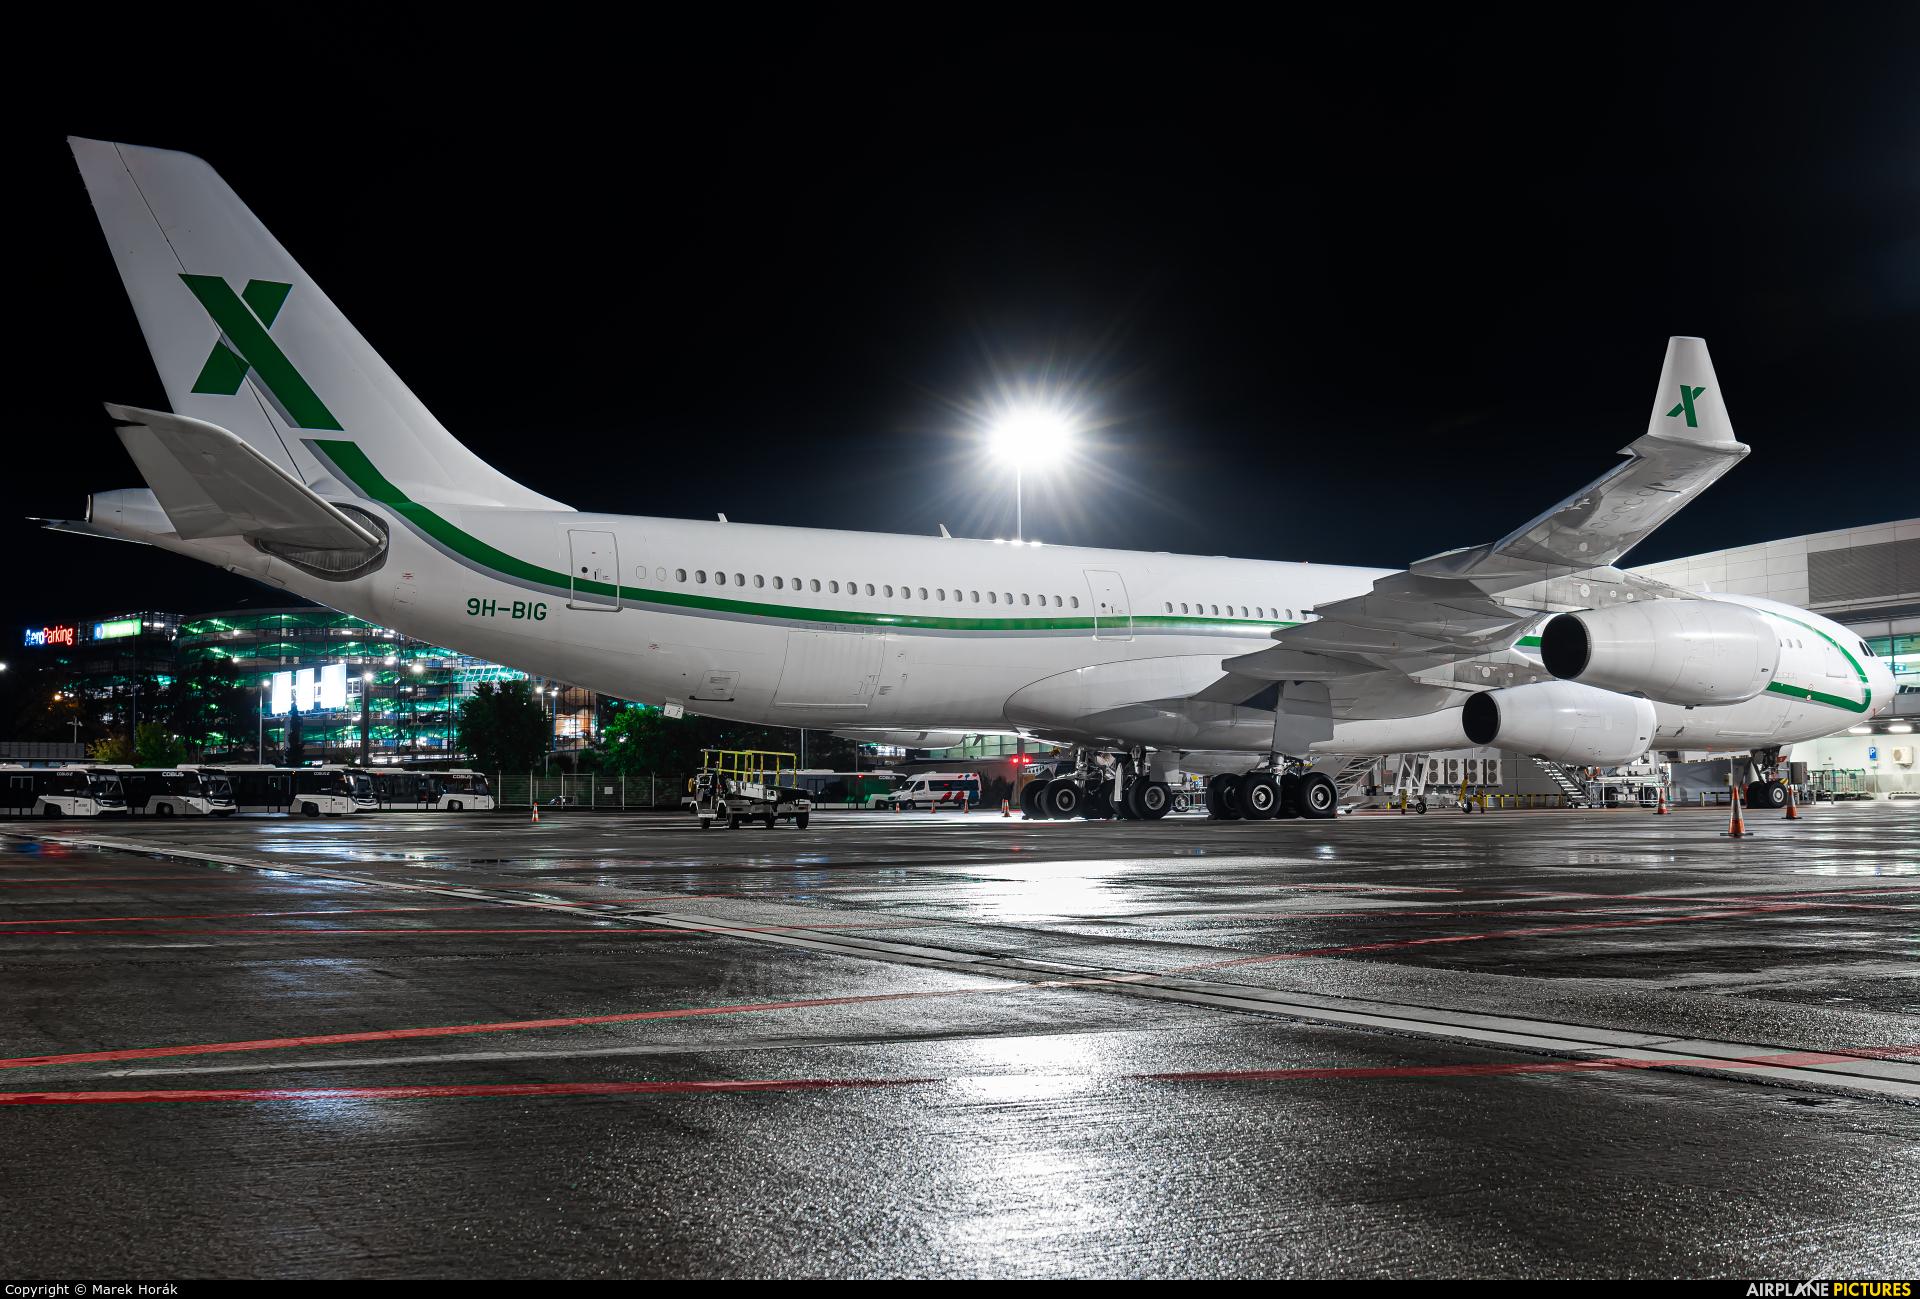 AIR X Charter 9H-BIG aircraft at Prague - Václav Havel